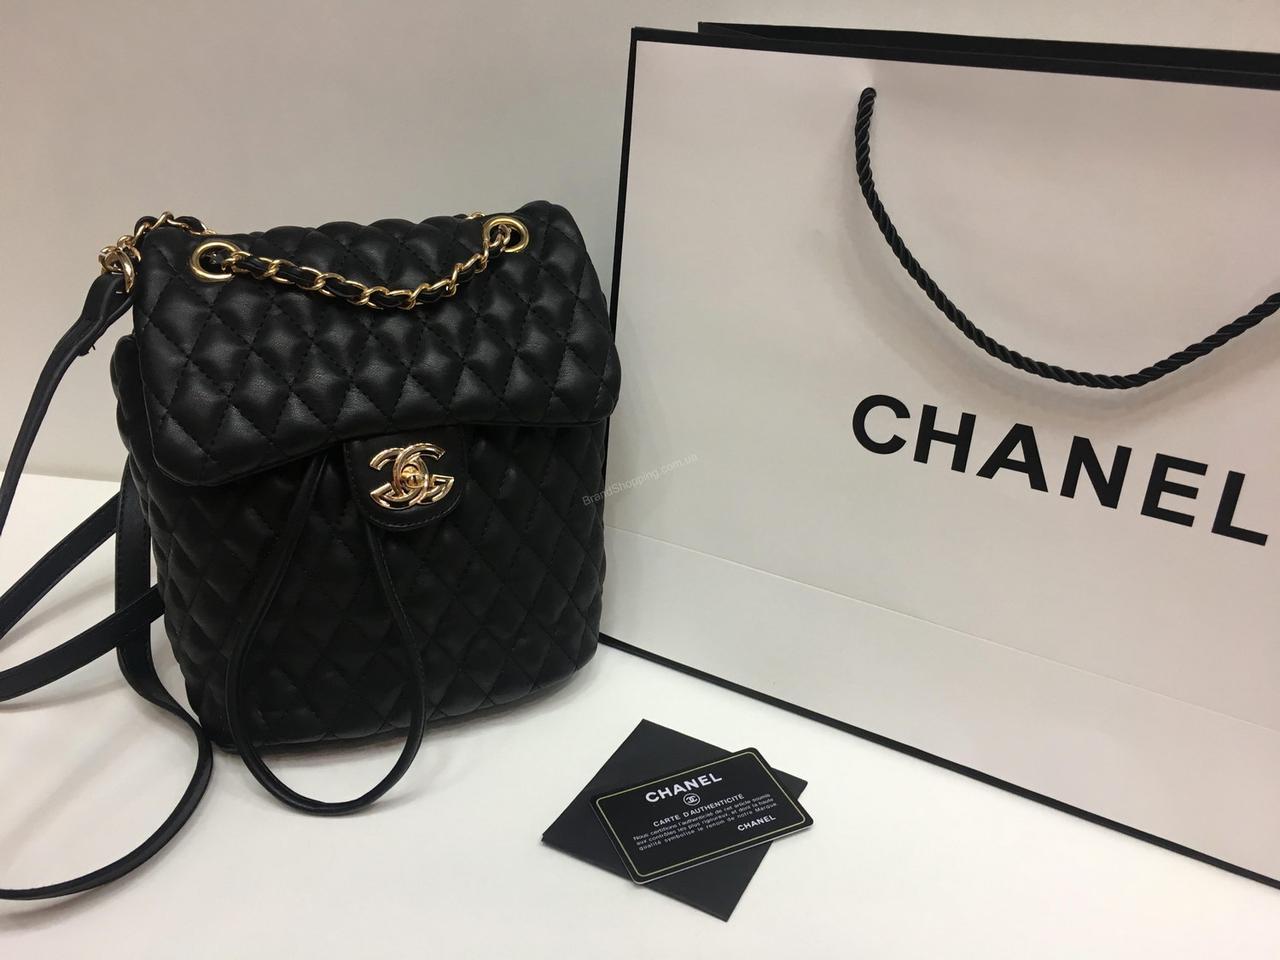 046274bff5aa Женский кожаный рюкзак- сумка (сумочка ) Chanel 0445 - Trendshops в Харькове